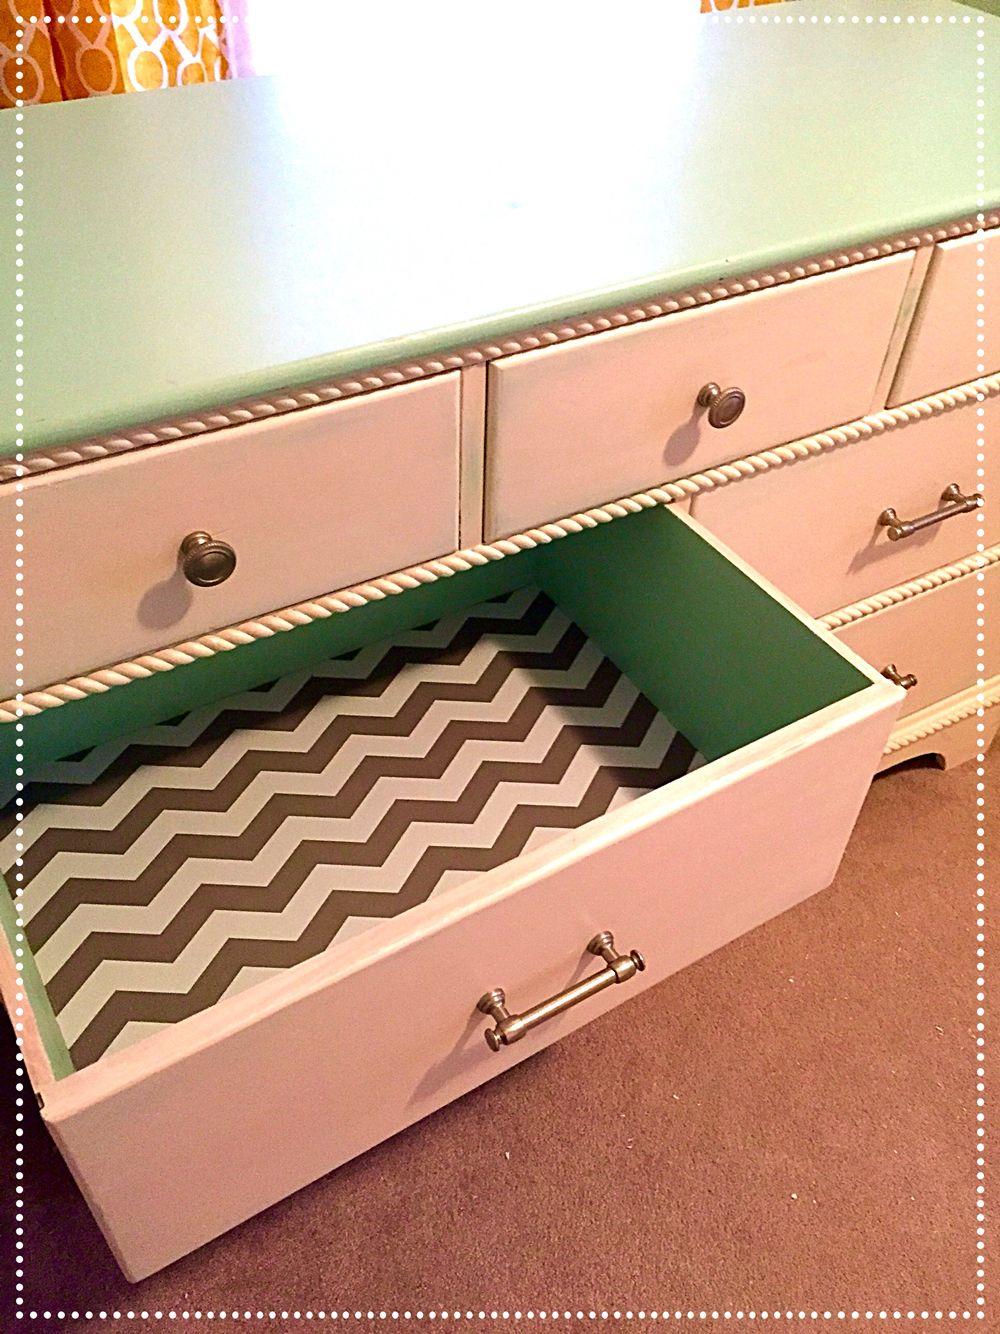 Shelf Liner Inside Dresser Drawers